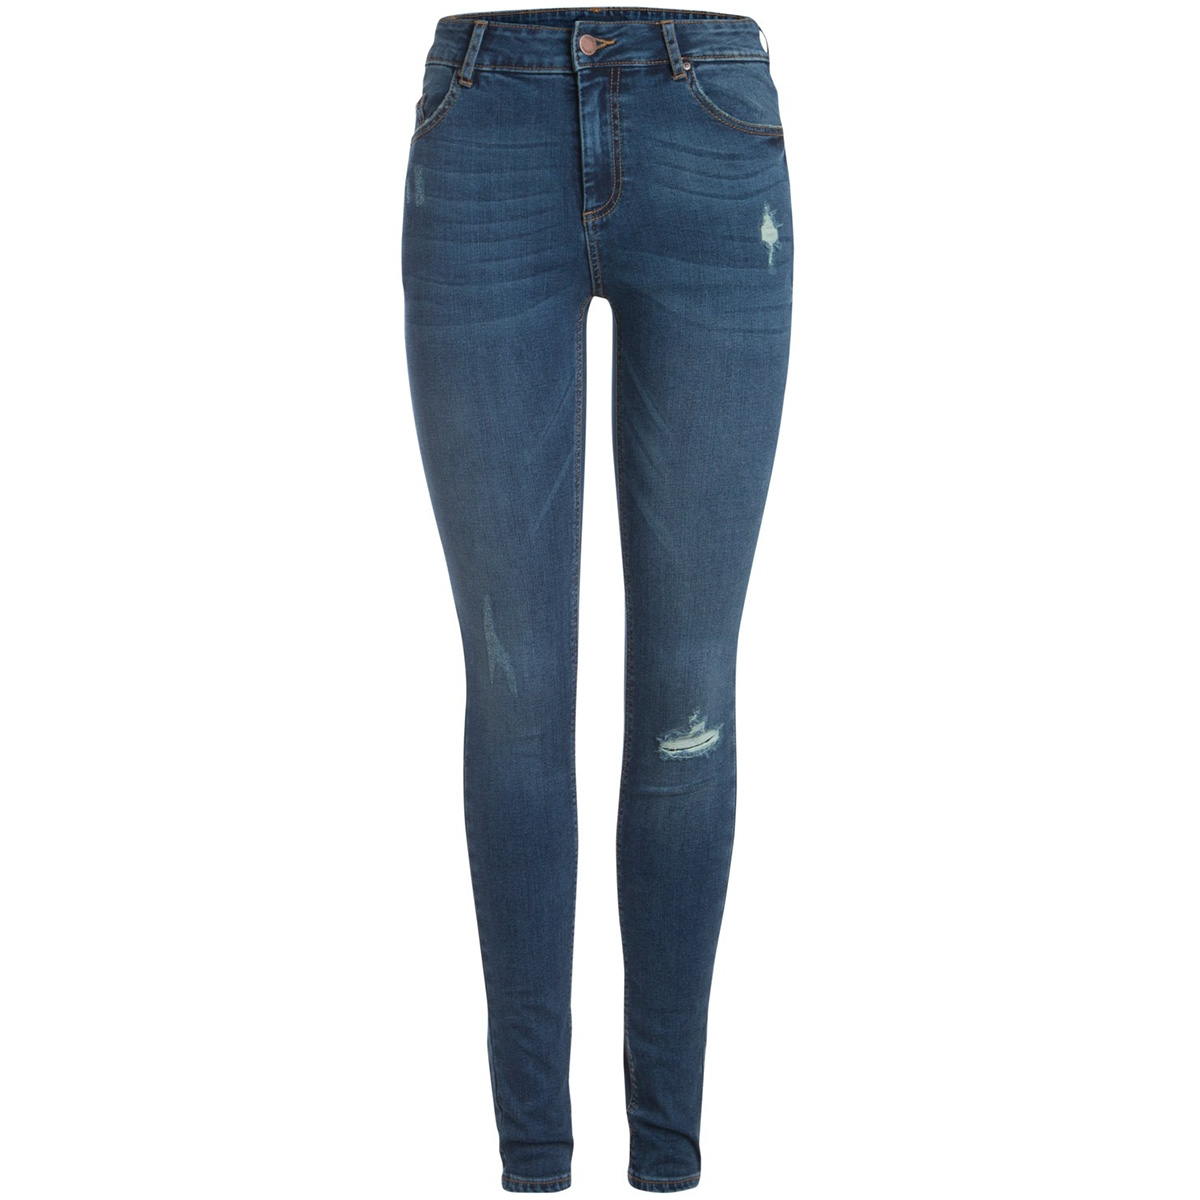 pcfive betty dnm f114 mw skn des mb 17082992 pieces jeans medium blue denim